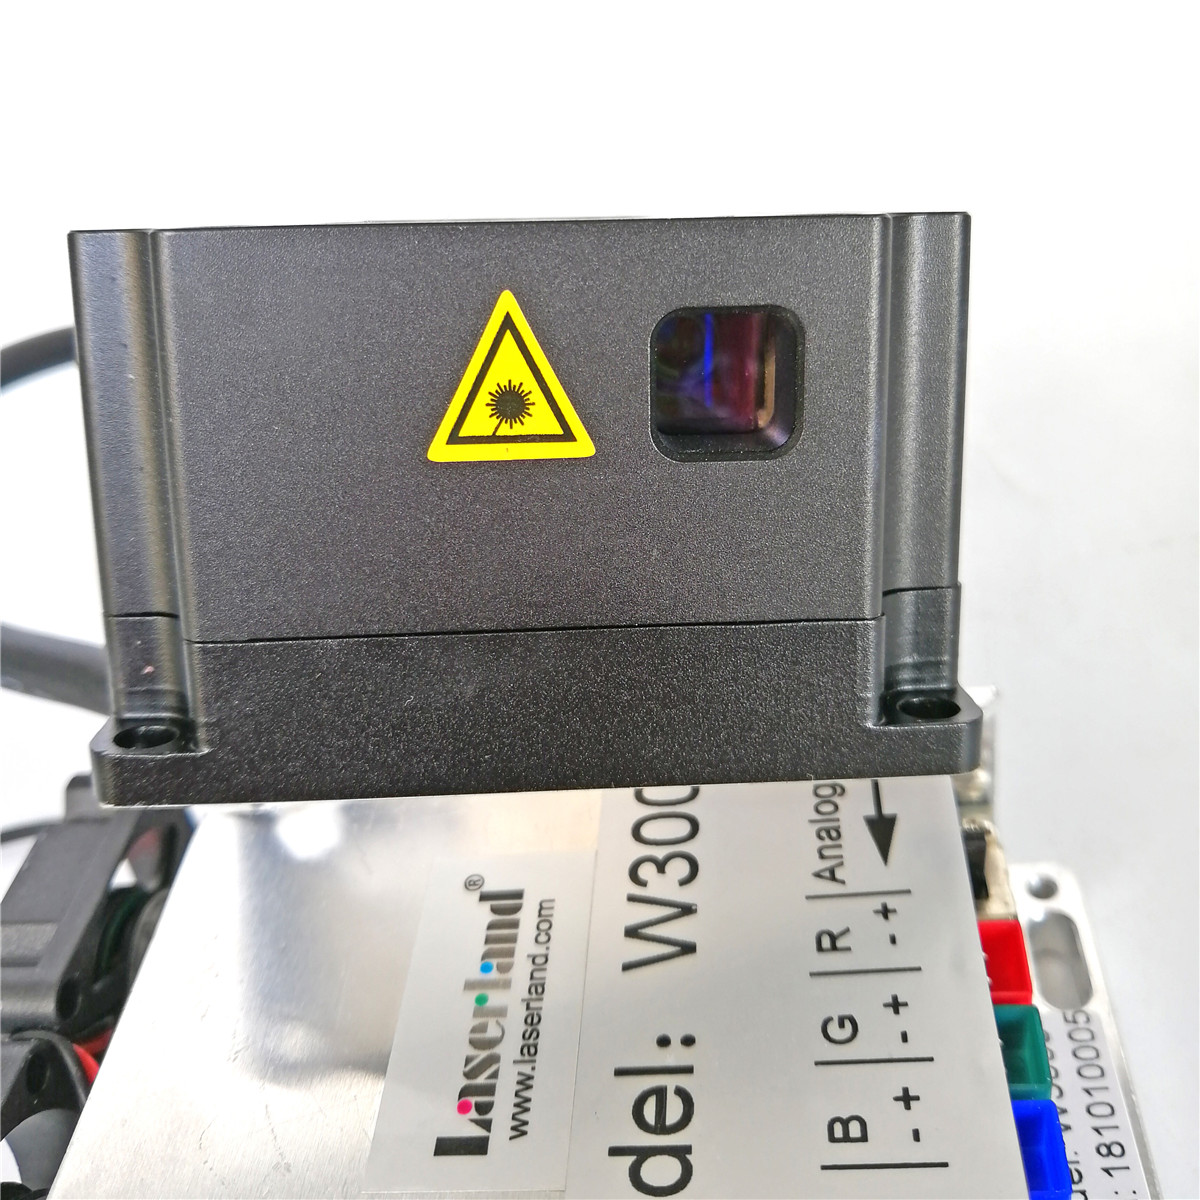 RGB 3000mW 3w White Laser Module Analog Full-color Laser Module for Stage Lighting DJ KTV Show Christmas Halloween Fun